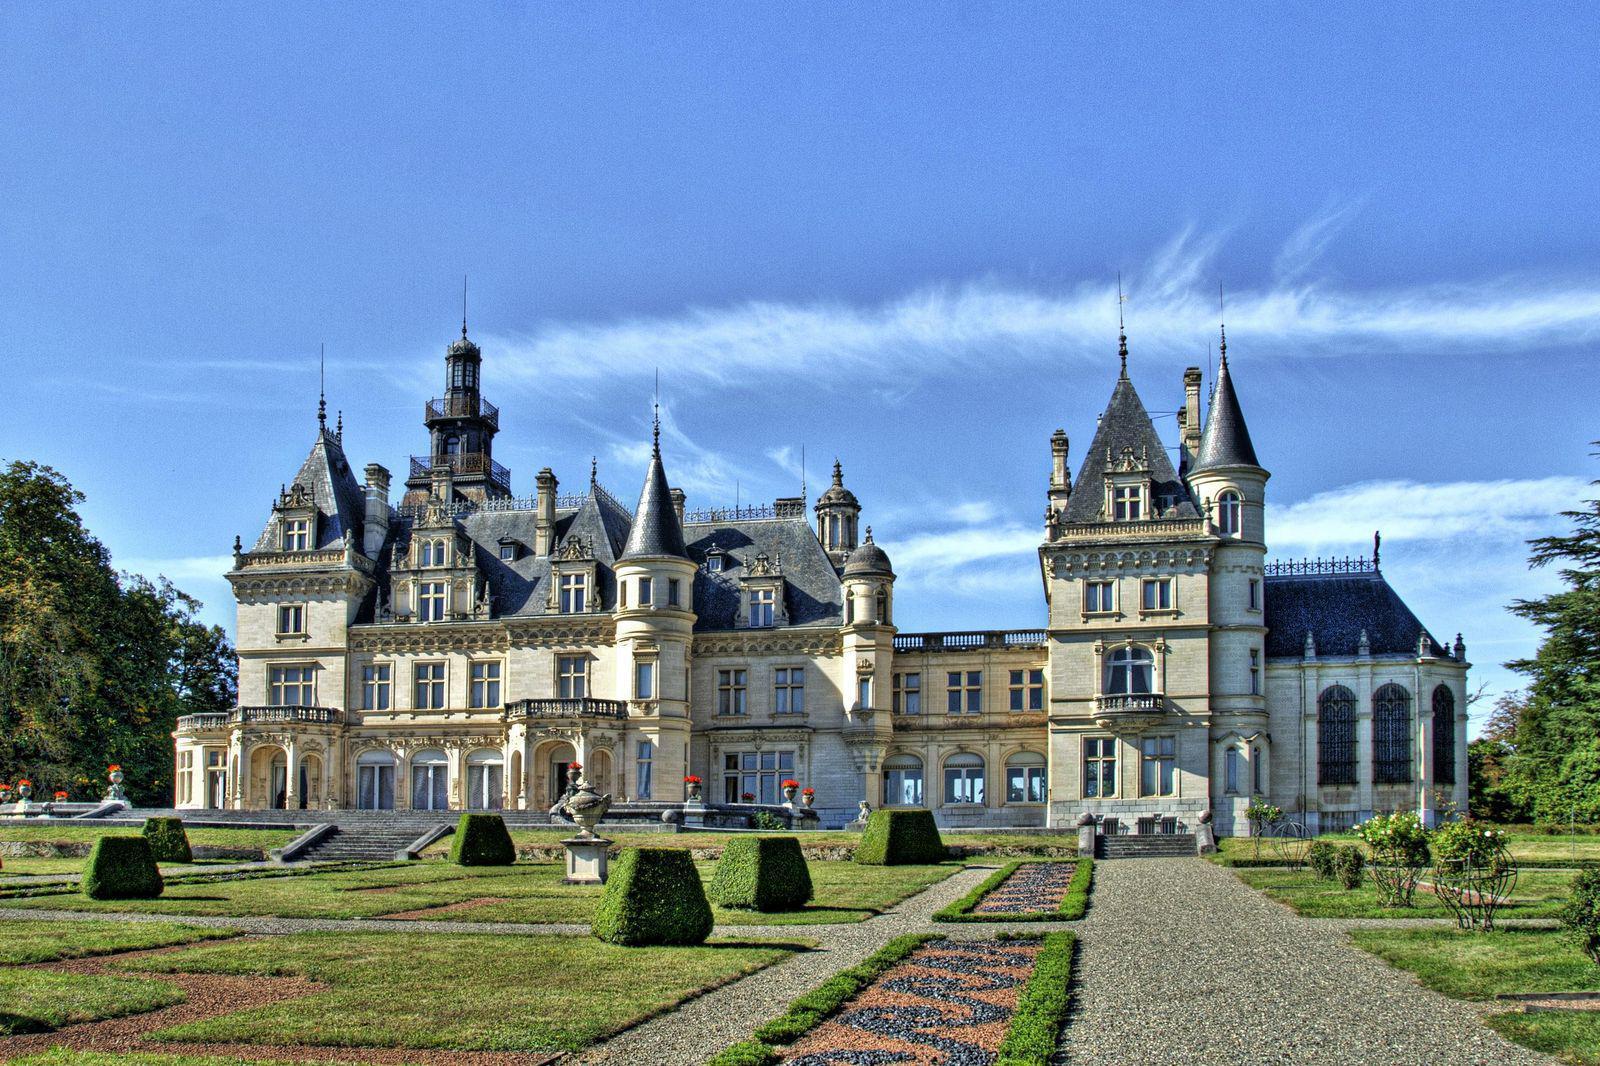 Image : Office de Tourisme* de Montréjeau